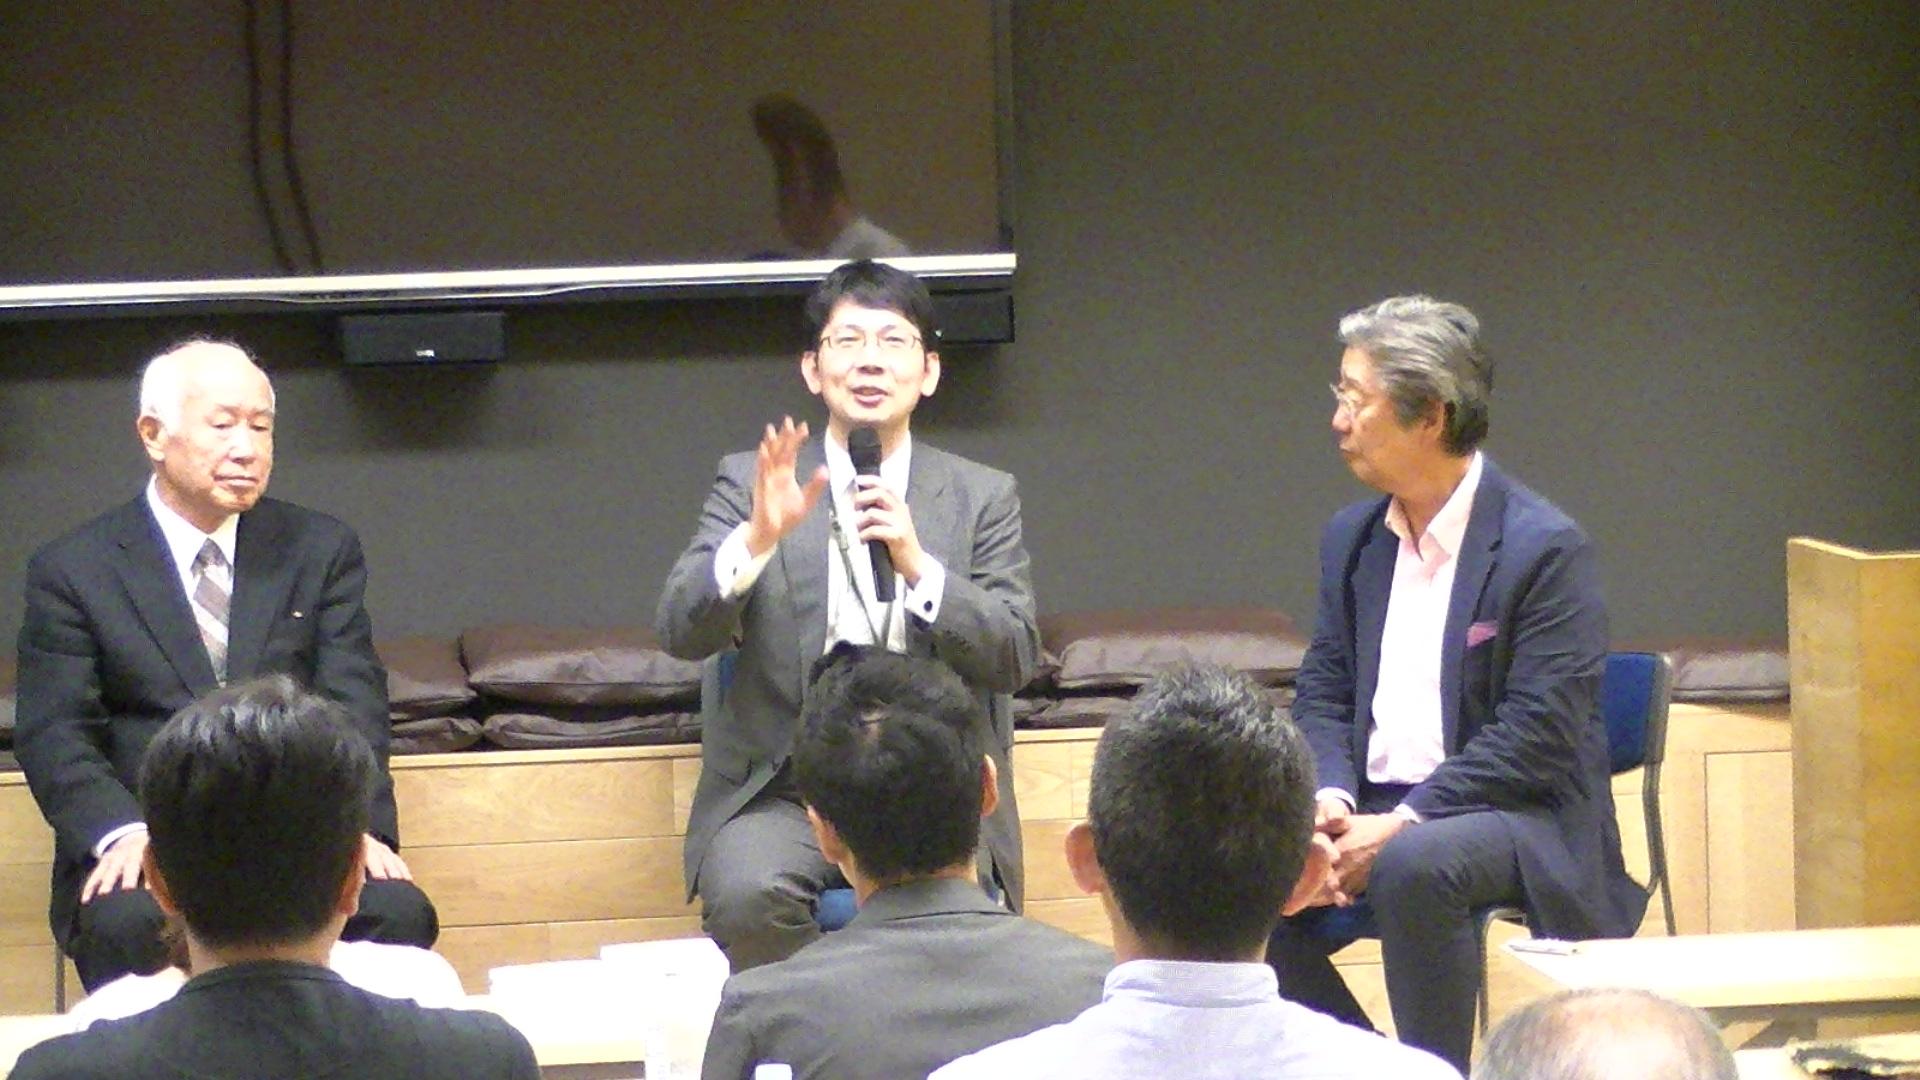 PIC 0042 - 4月1日東京思風塾の開催になります。